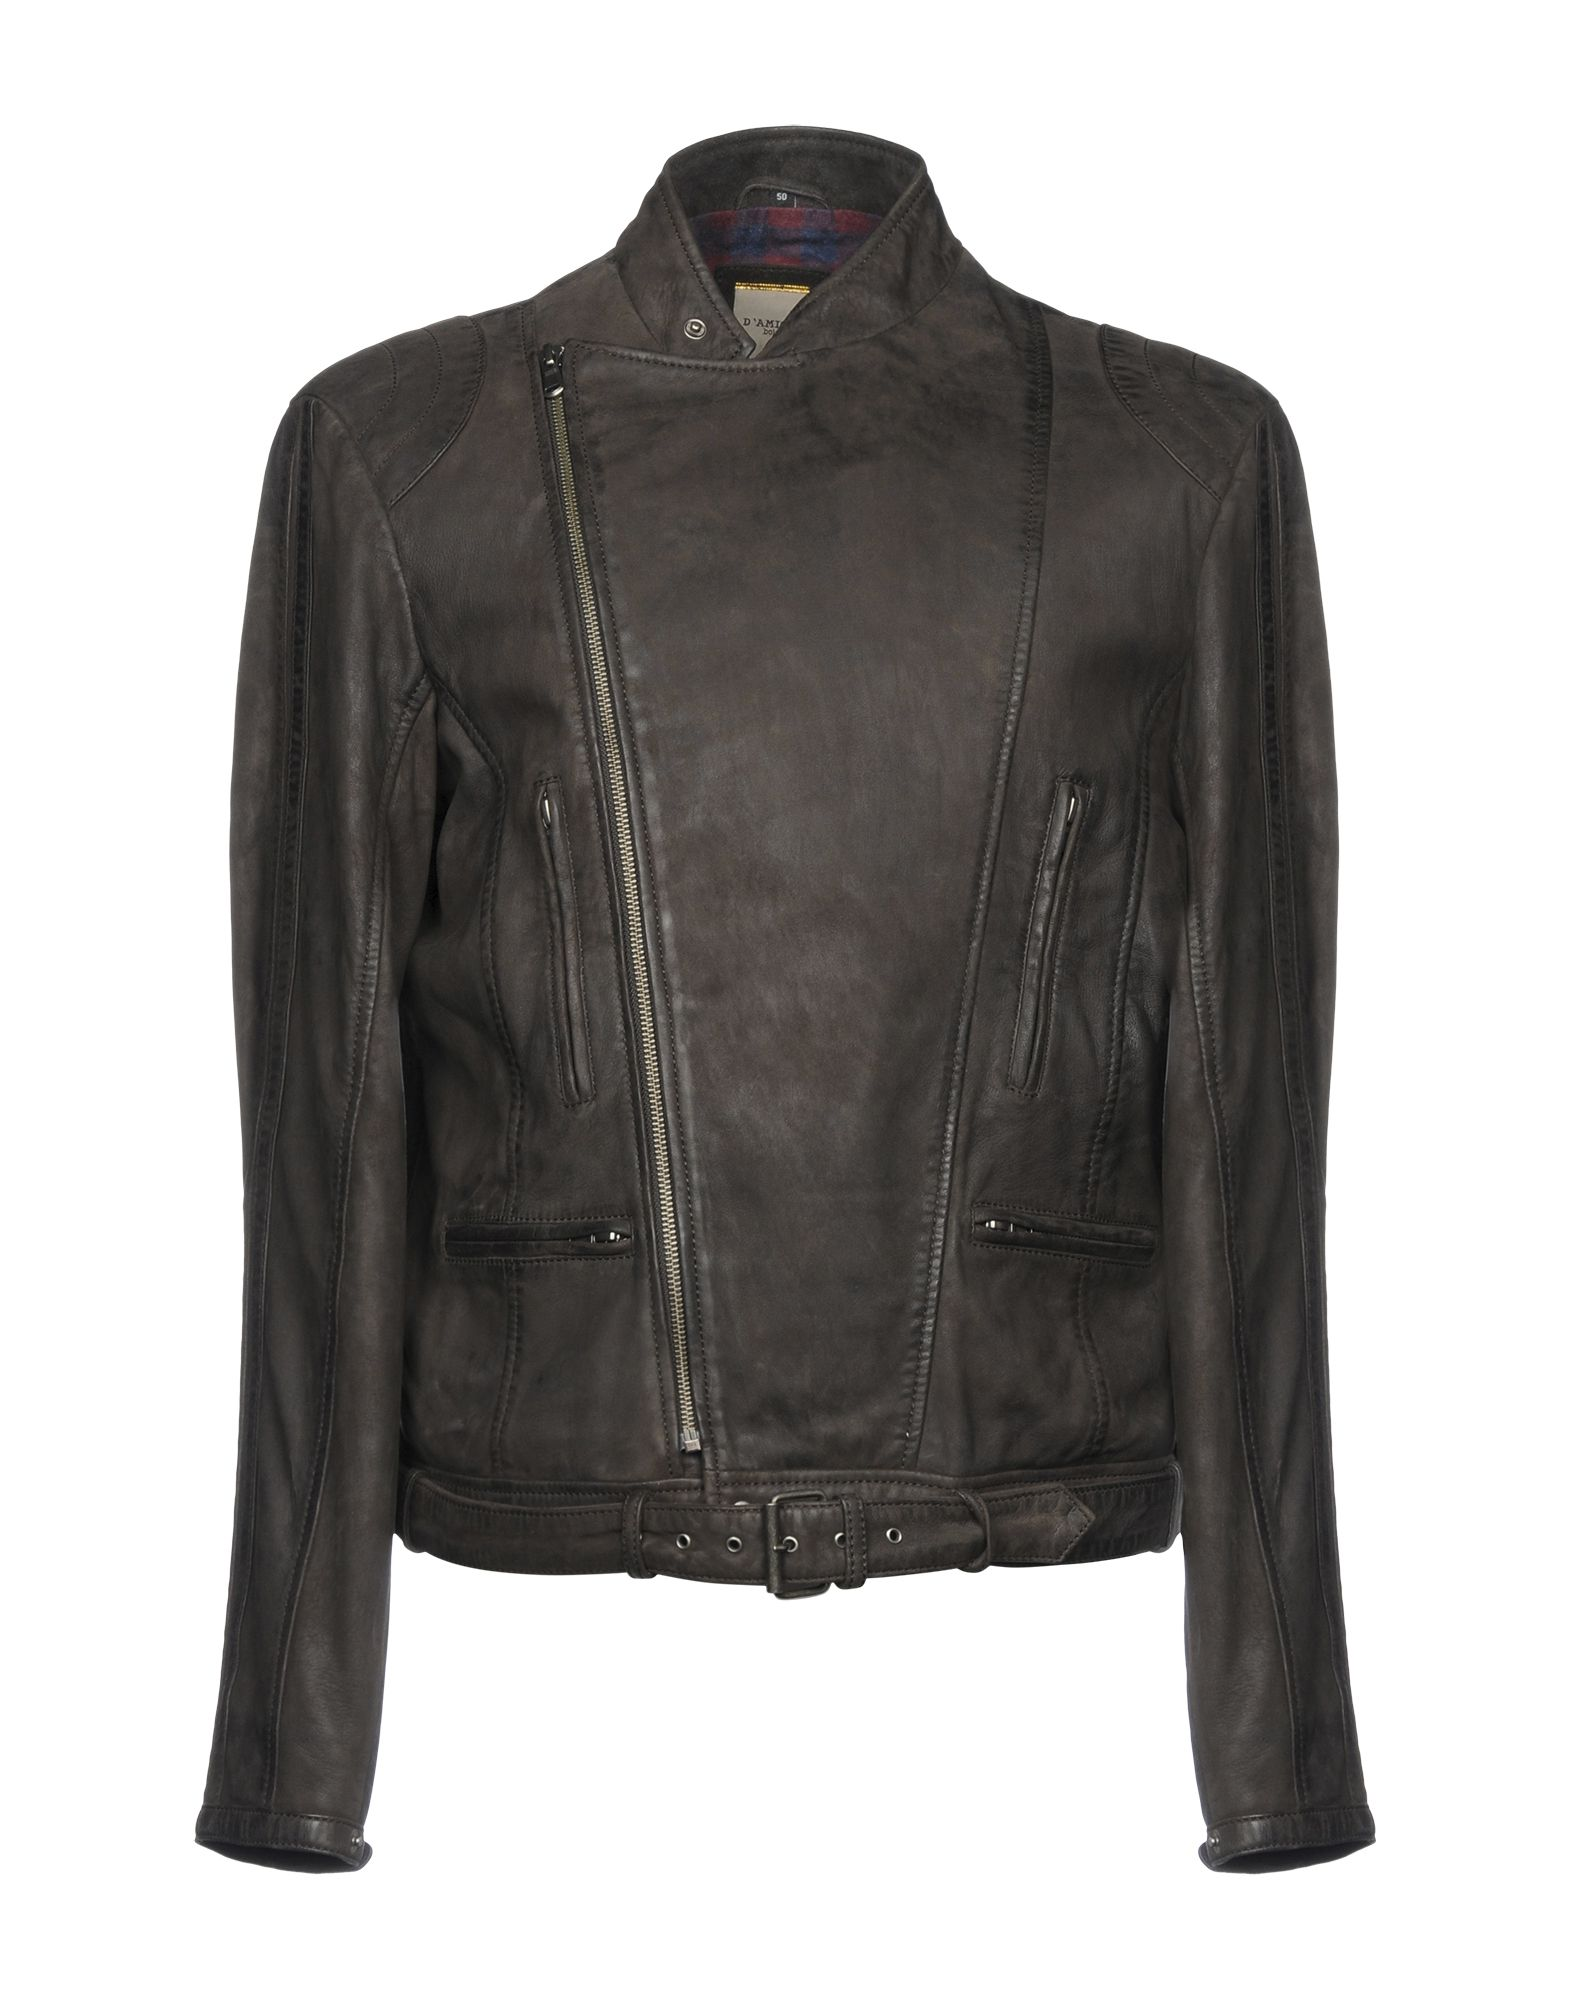 D'AMICO Jackets in Dark Brown